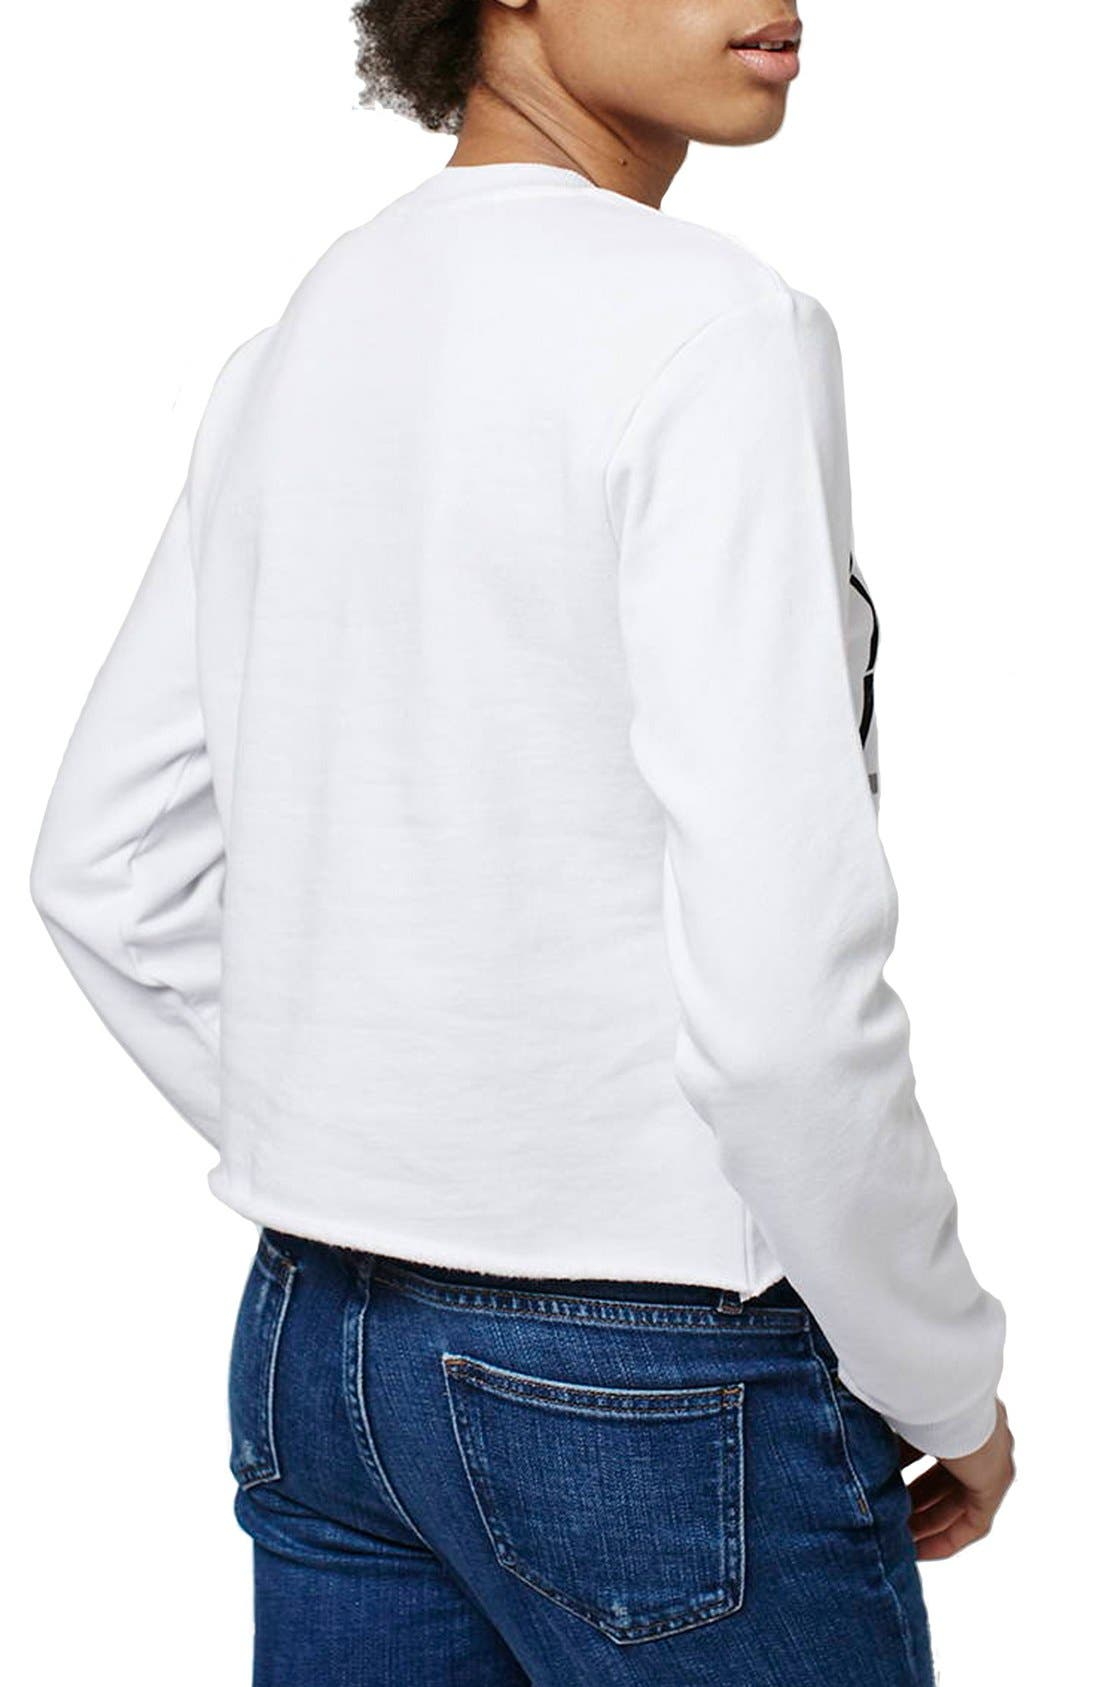 Alternate Image 3  - Topshop 'Brklyn' Graphic Sweatshirt